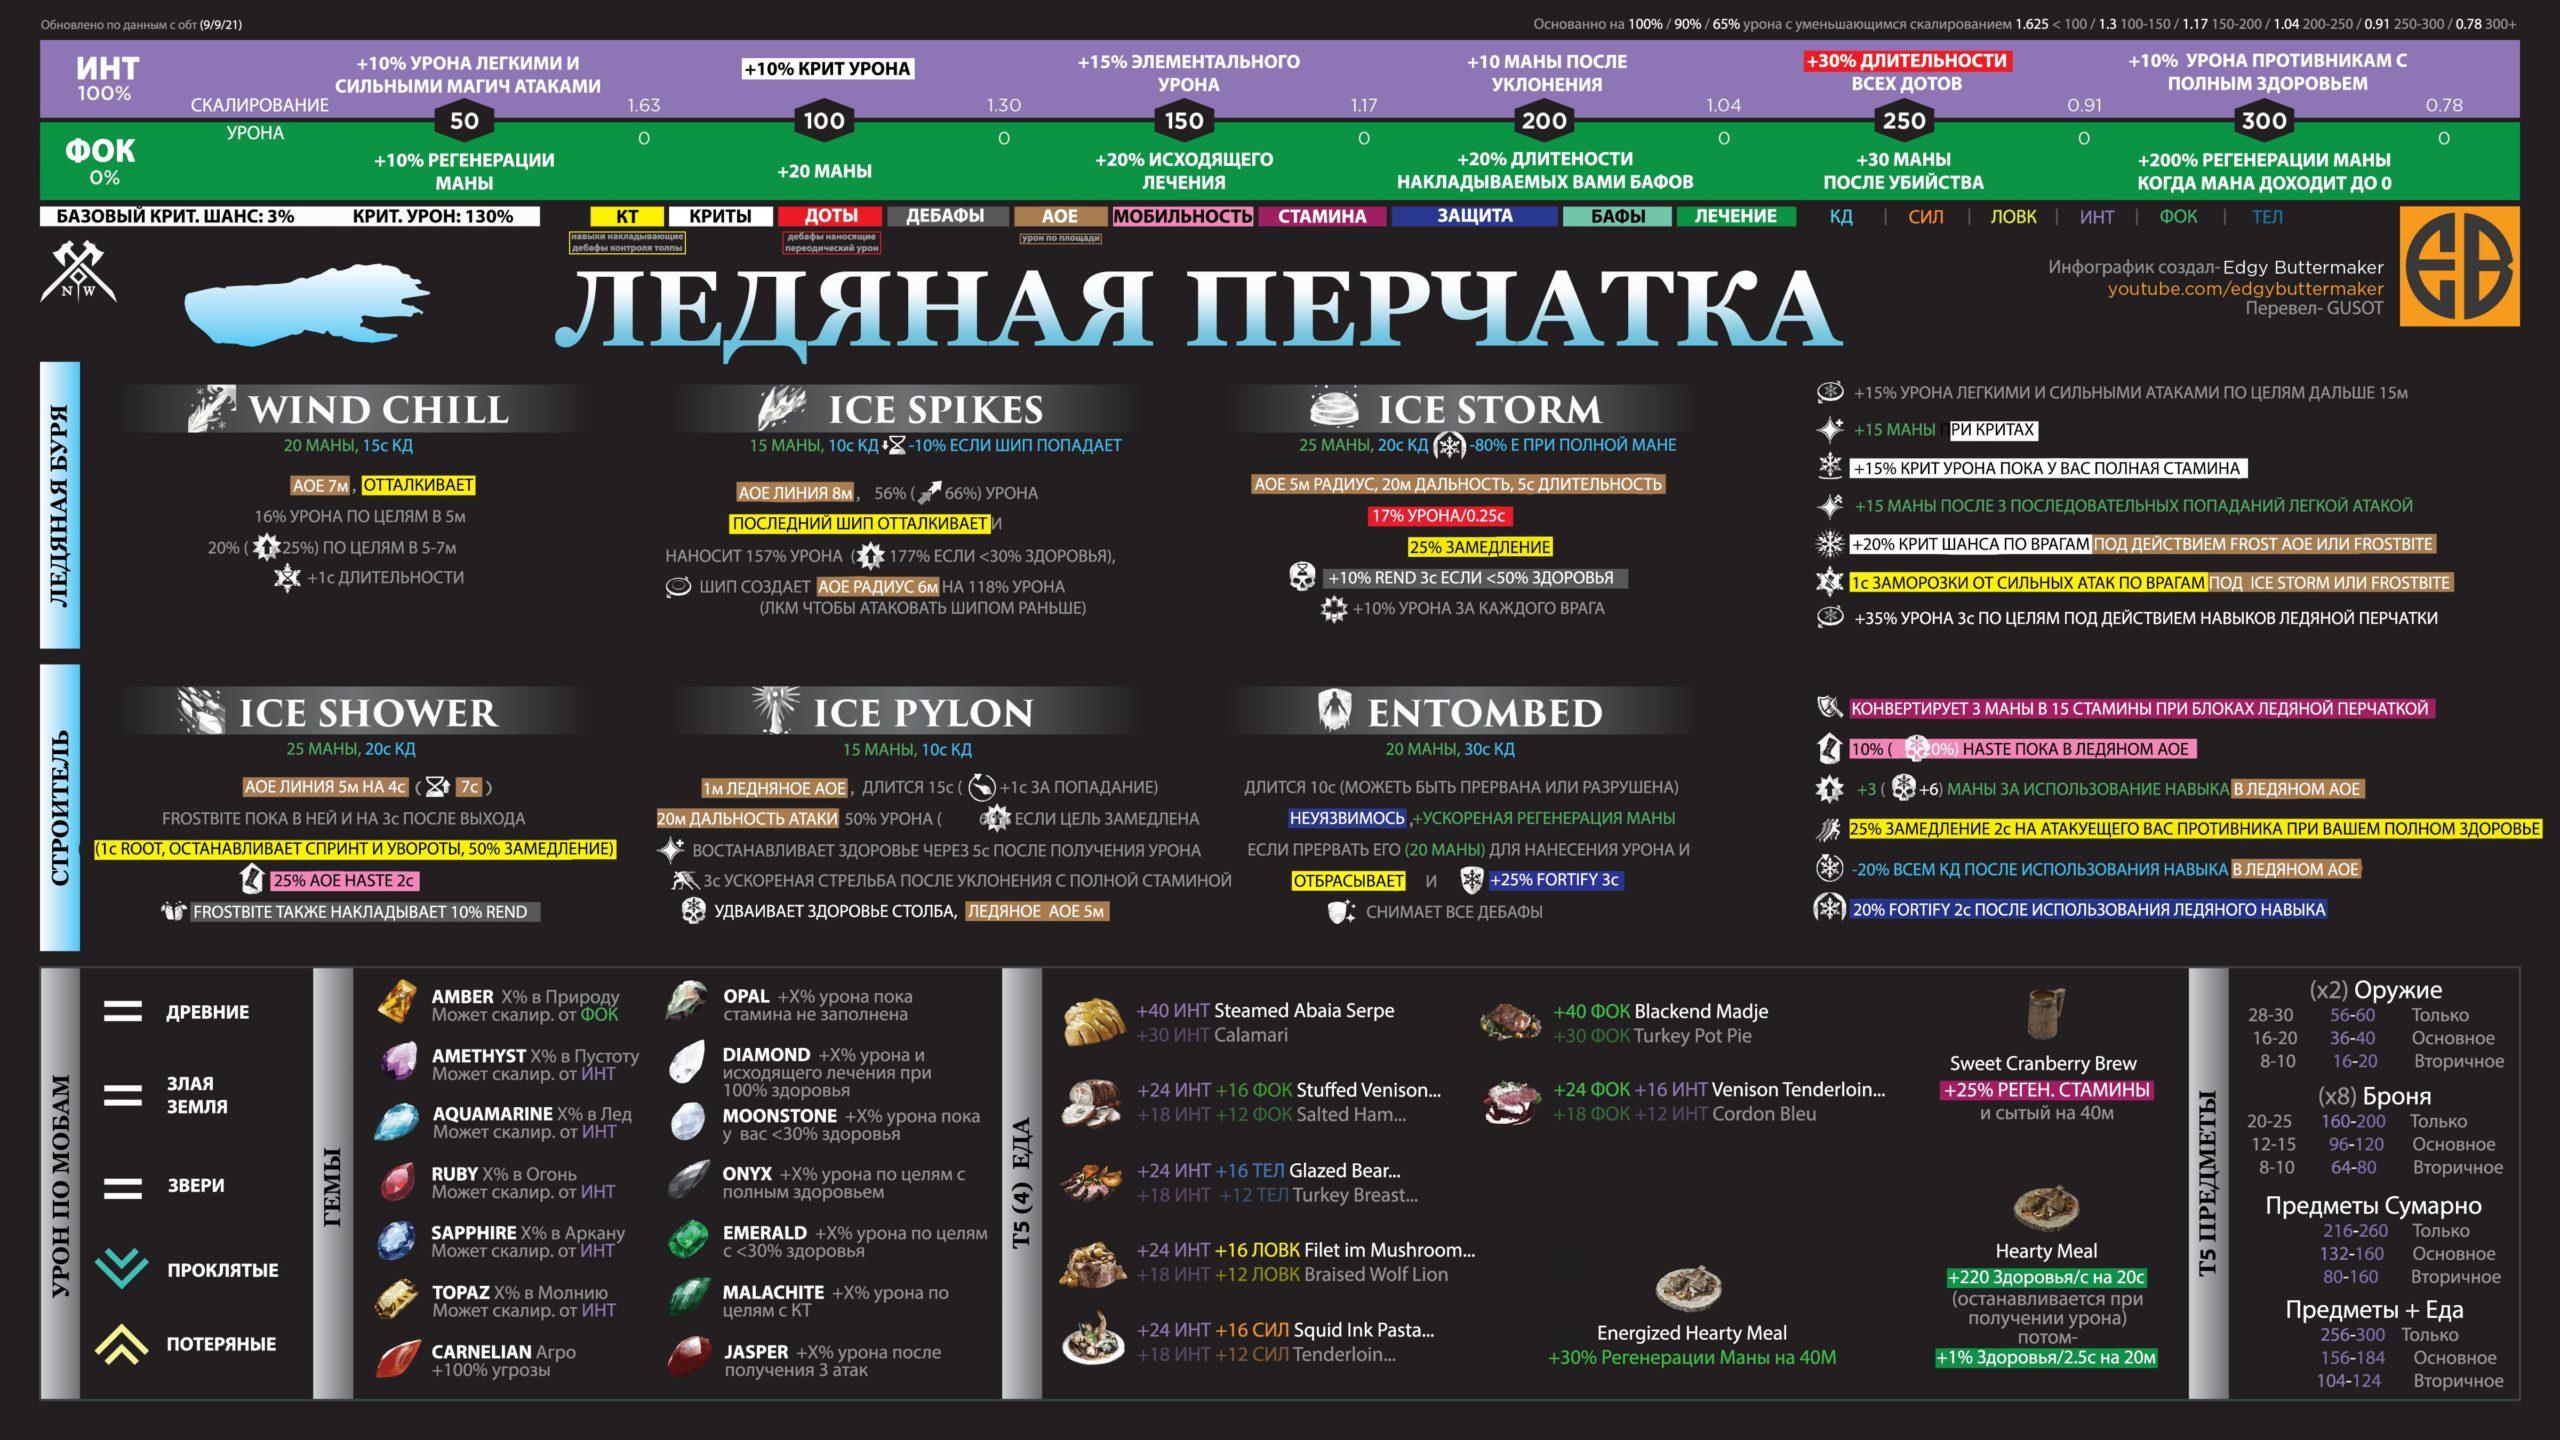 Ice Gauntlet. Памятка на русском языке